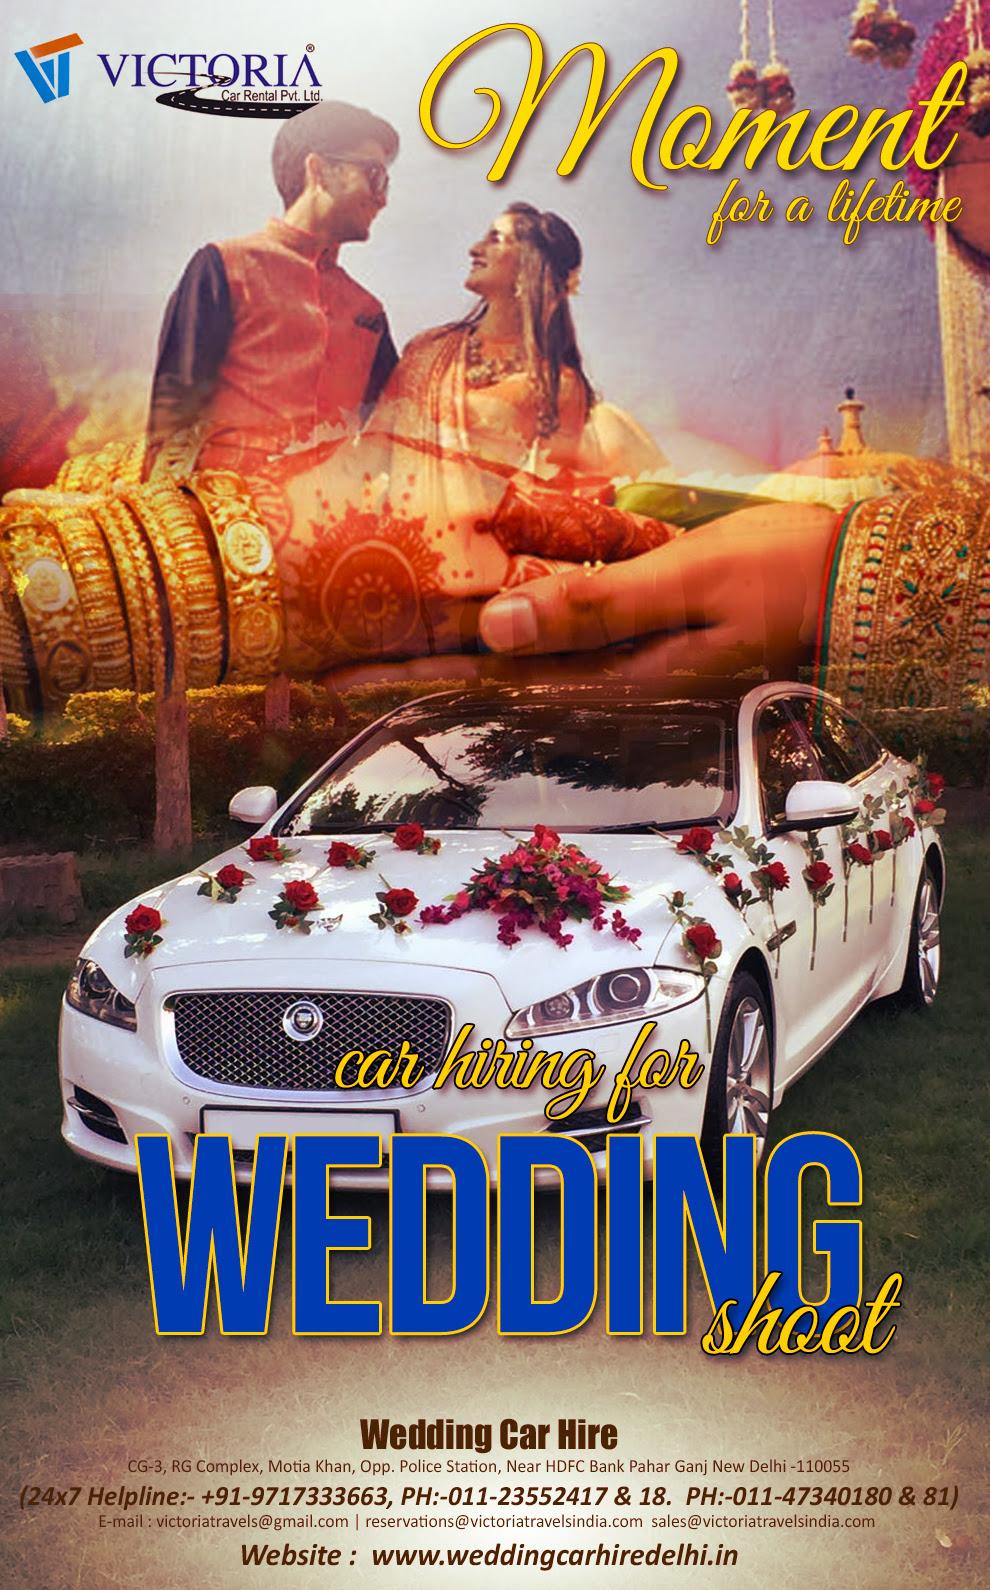 Http Punjabcarhire Com Rentals Our Fleets Html Luxury Limousin Car Hire Delhi Punjab Luxury Car Hire Wedding Car Hire Car Hire